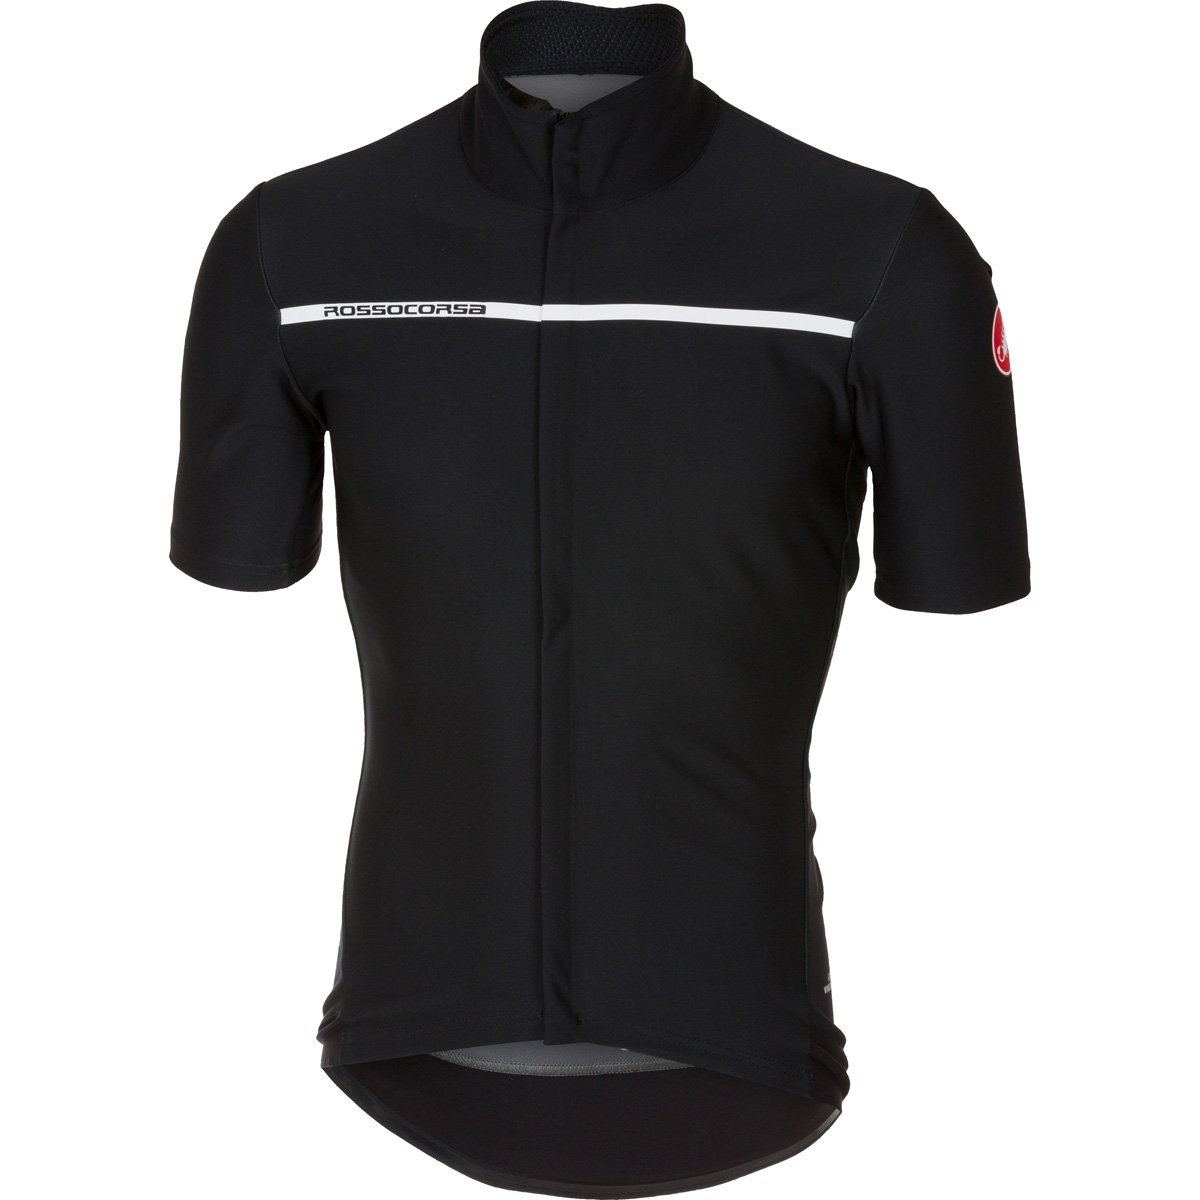 Castelli メンズ Gabba 3 半袖サイクリングジャケット - B17084 B075G65MGG XX-Large|ライトブラック ライトブラック XX-Large